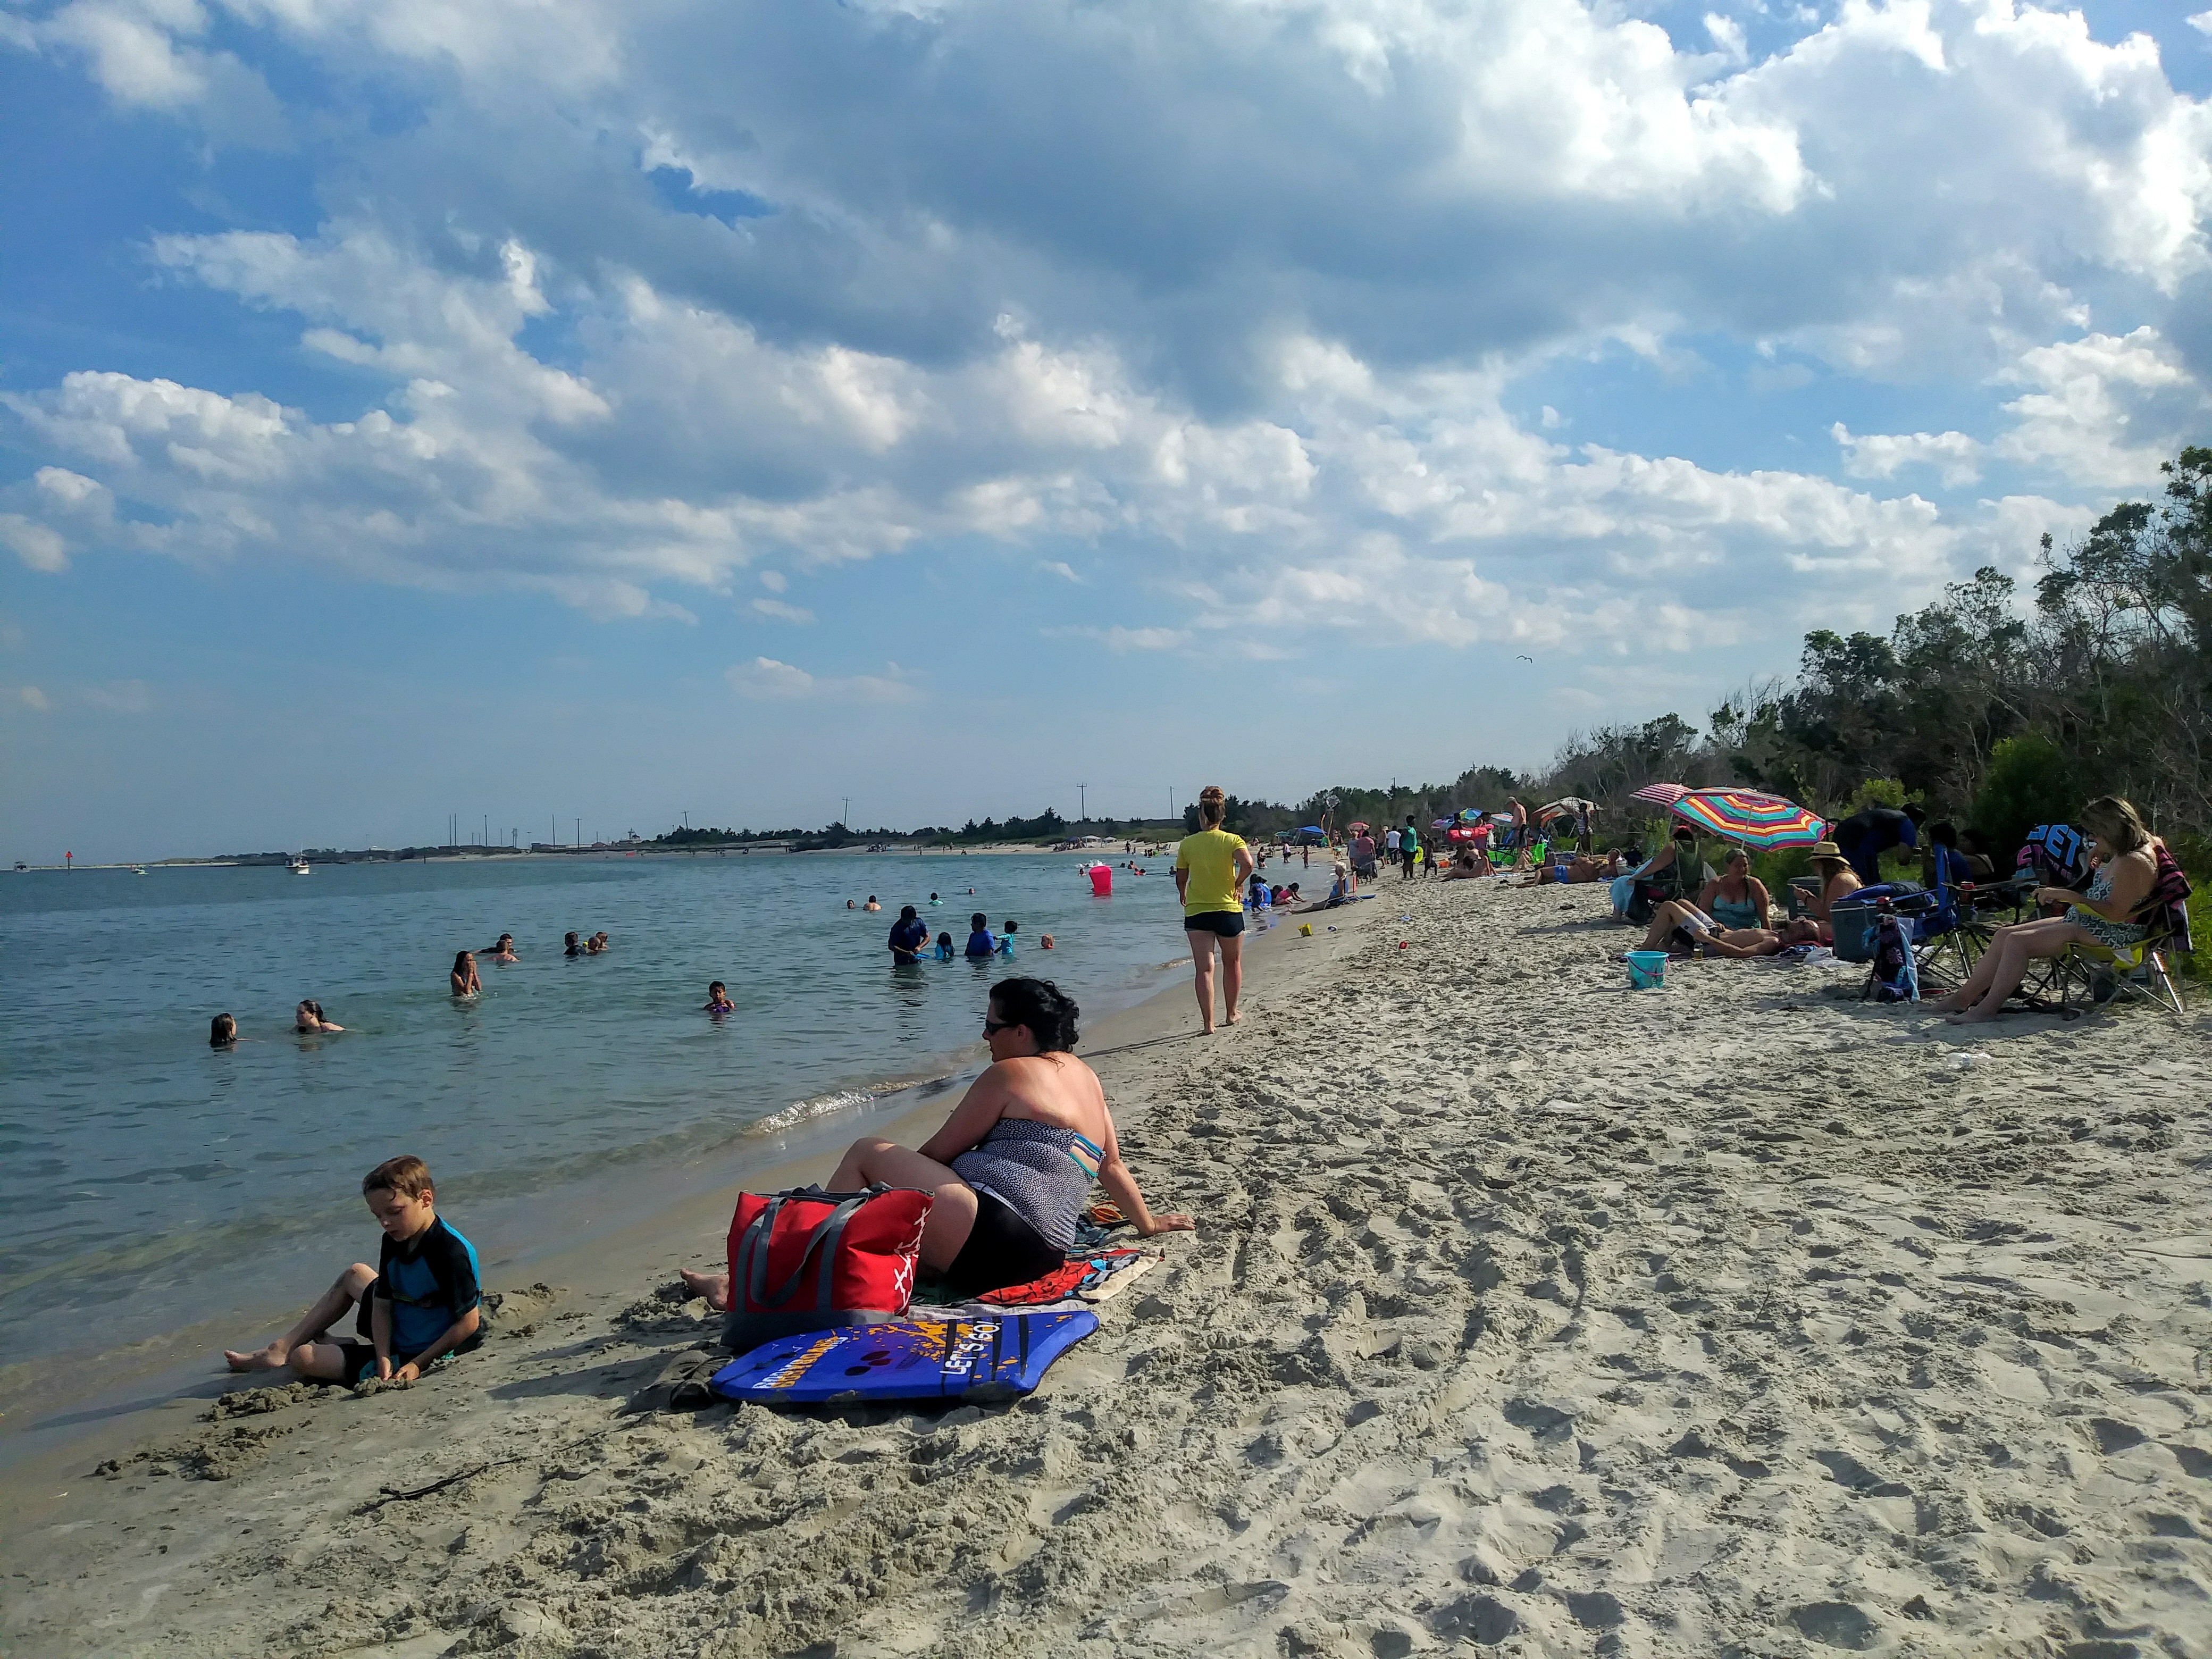 Radio Island Public Beach Access In Beaufort NC And